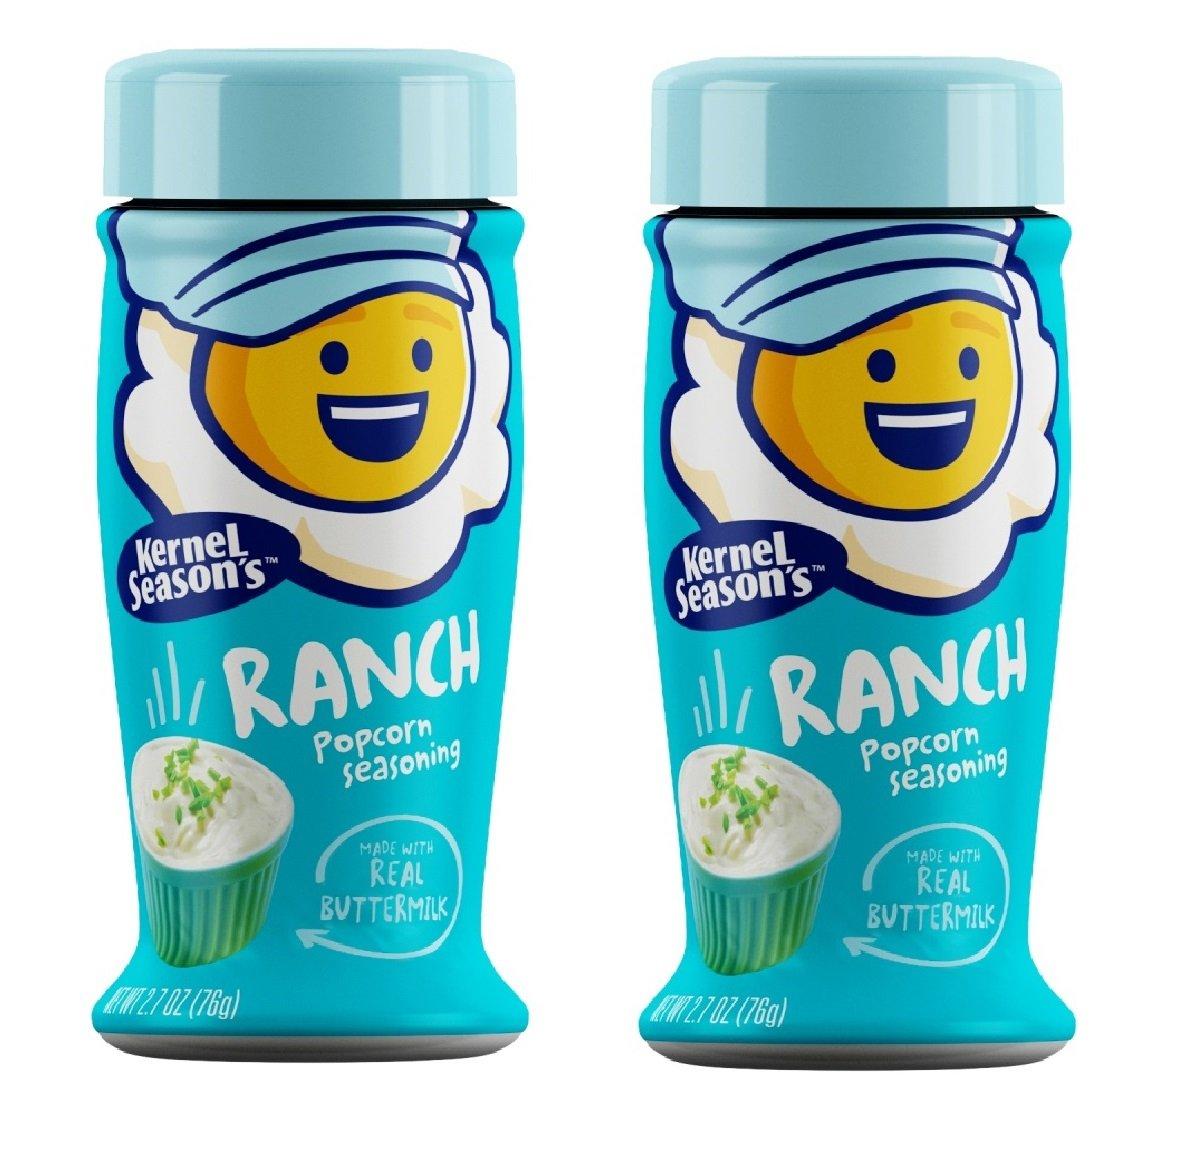 Kernel Season's Popcorn Seasoning-Ranch-2.7 Oz-2 Pack